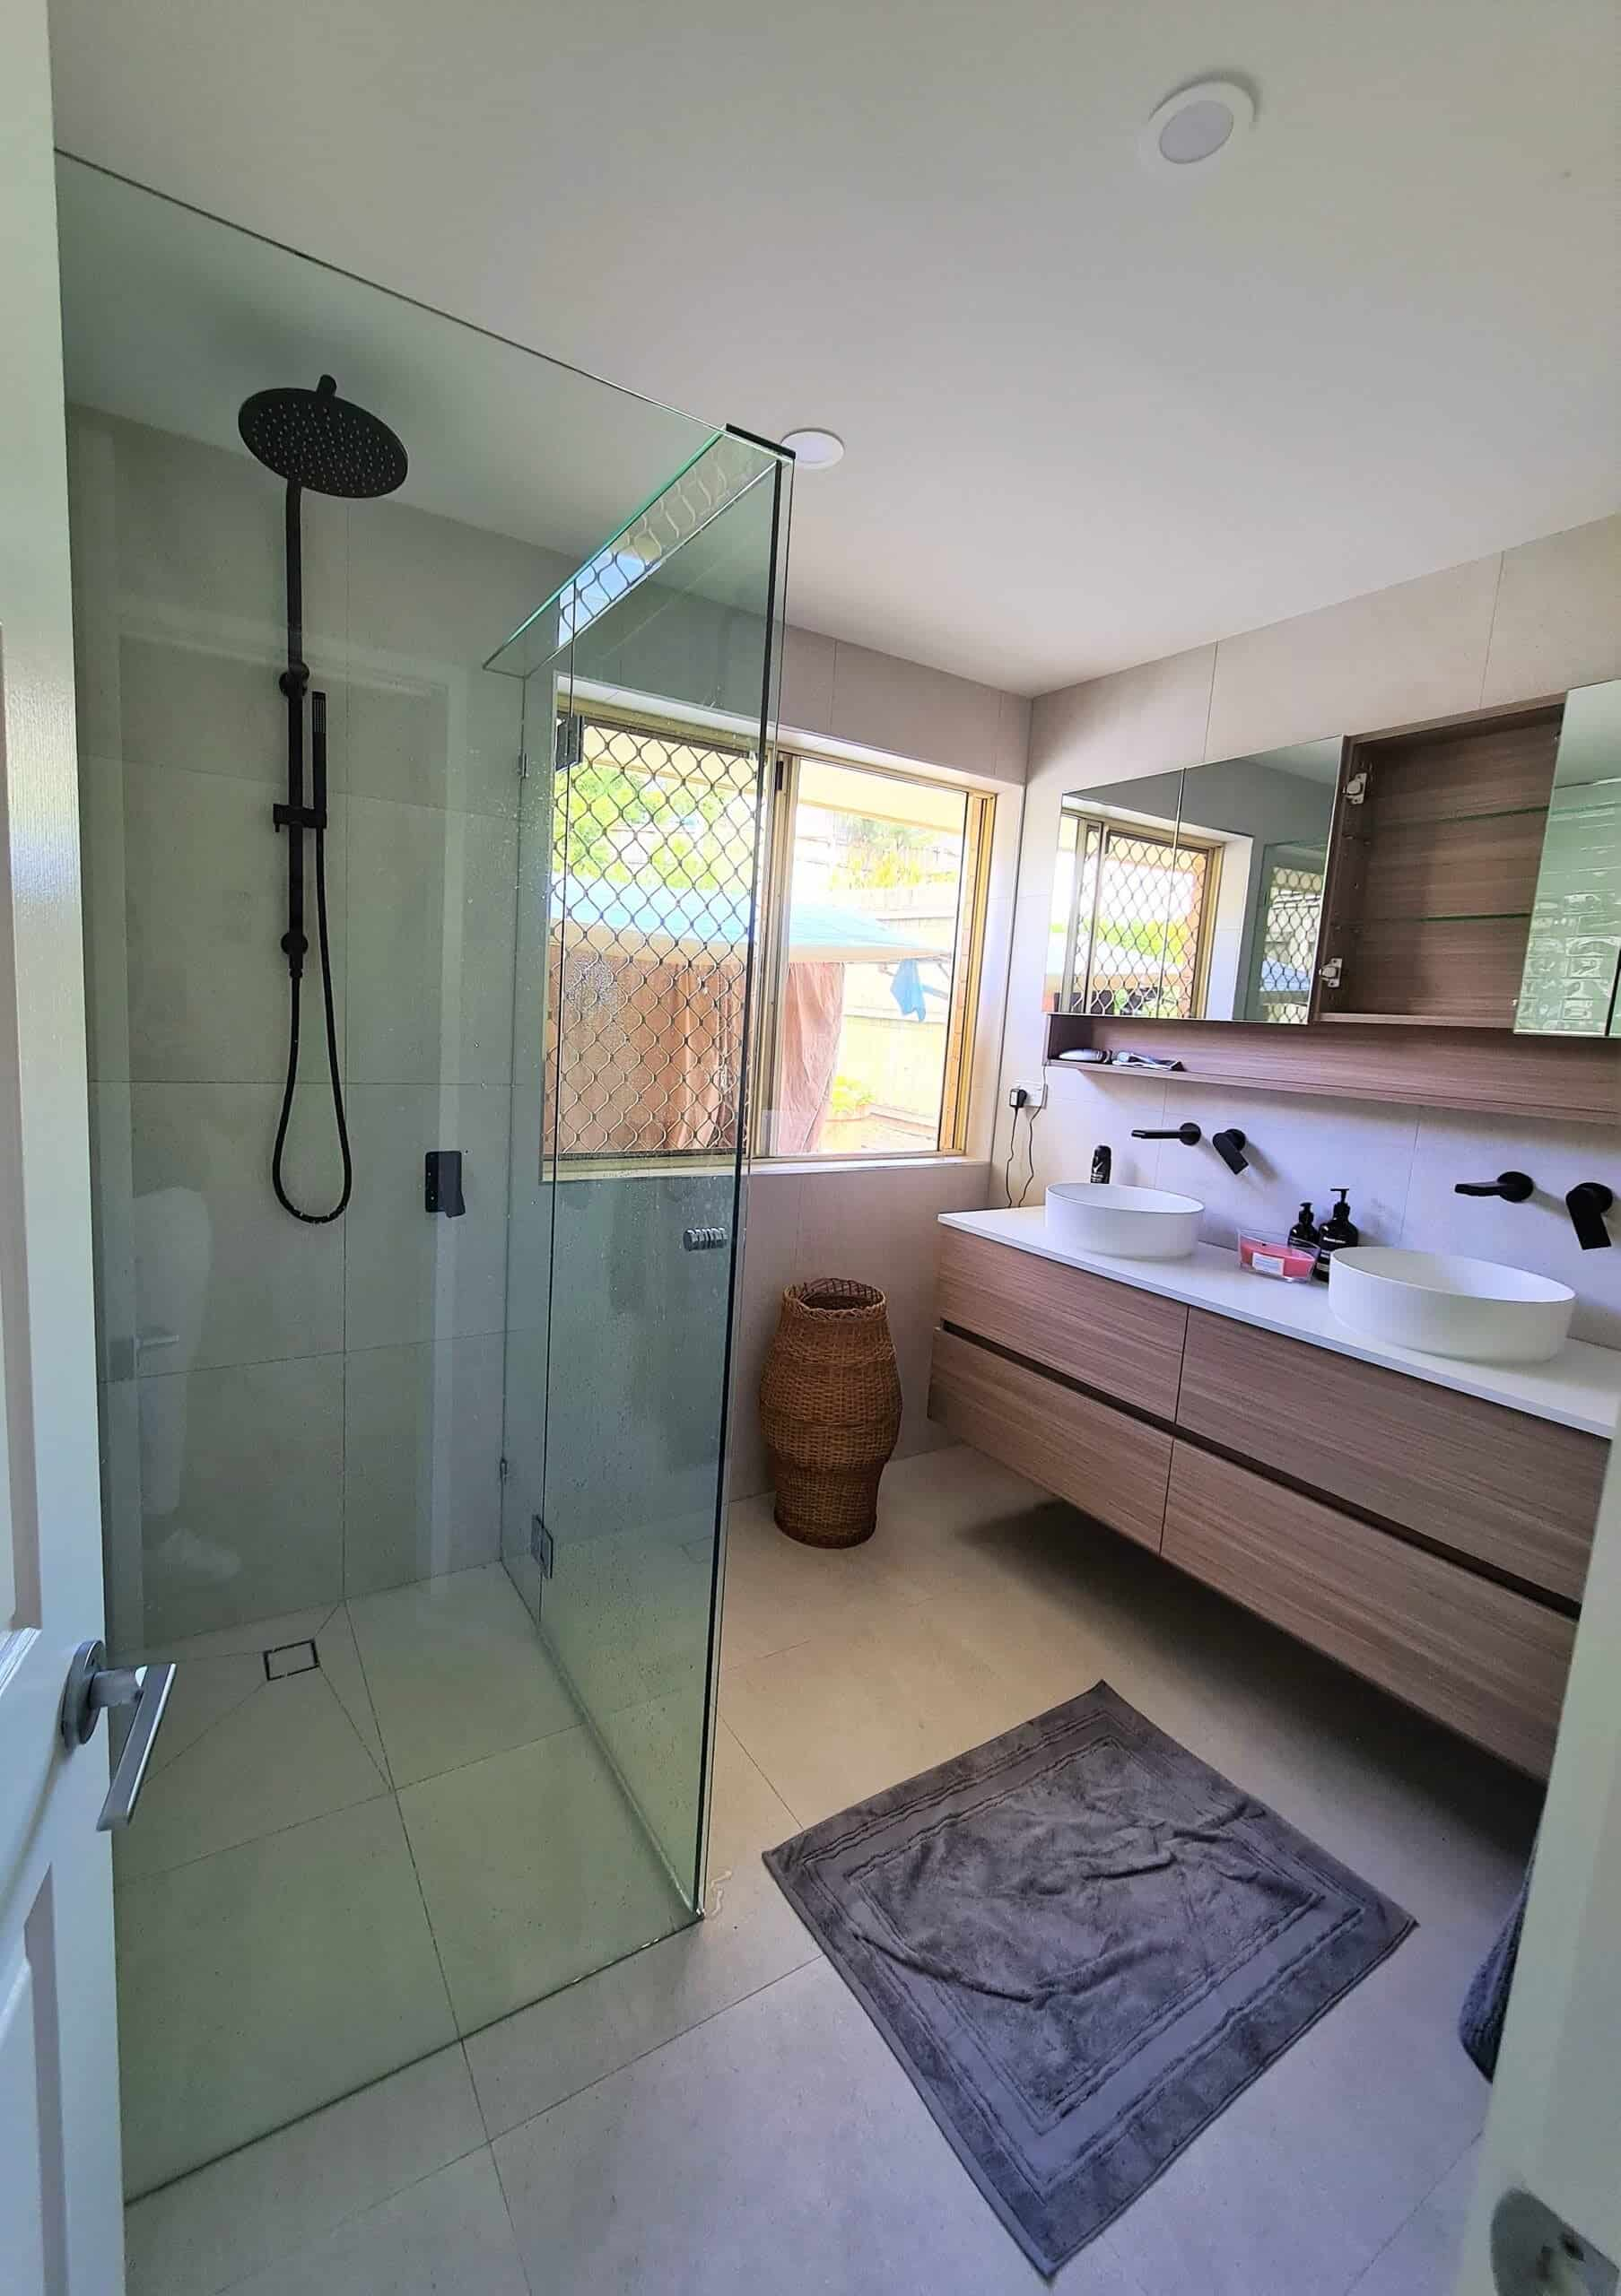 Wishart bathroom renovation